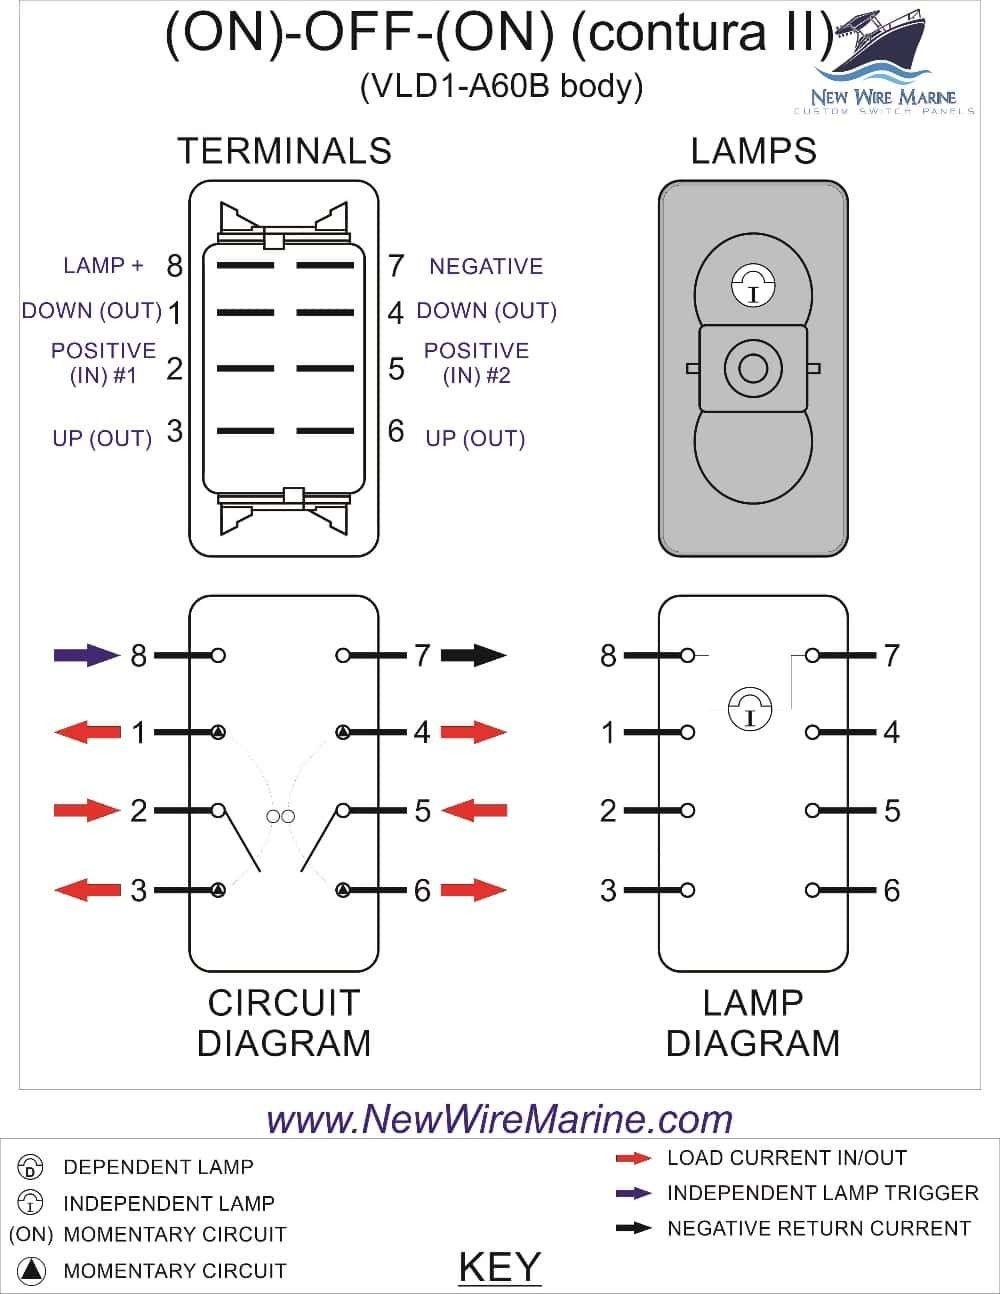 Elegant Winch Switch Wiring Diagram in 2020 | Wire, Diagram, Relay | Winch Switch Wiring Diagram |  | Pinterest